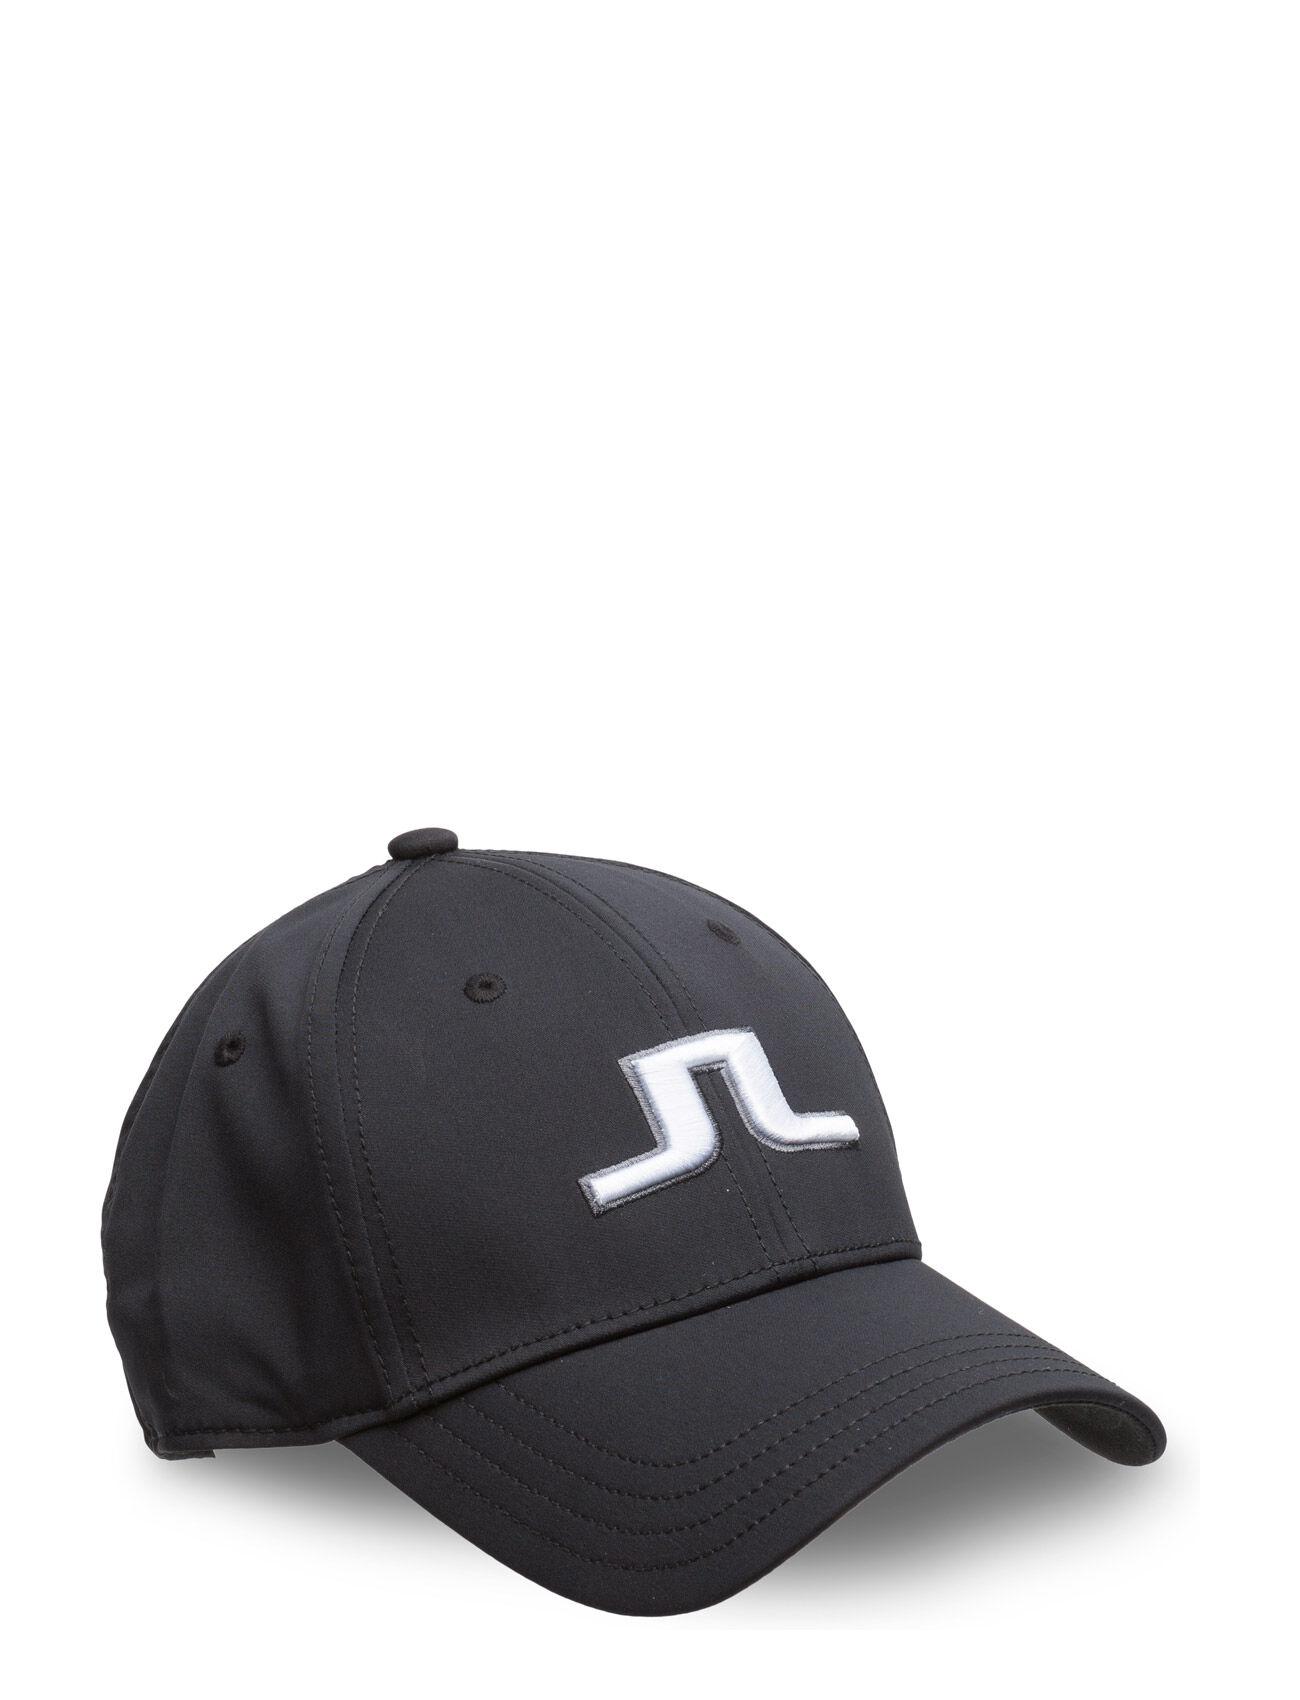 J. Lindeberg Golf Angus Tech Stretch Cap